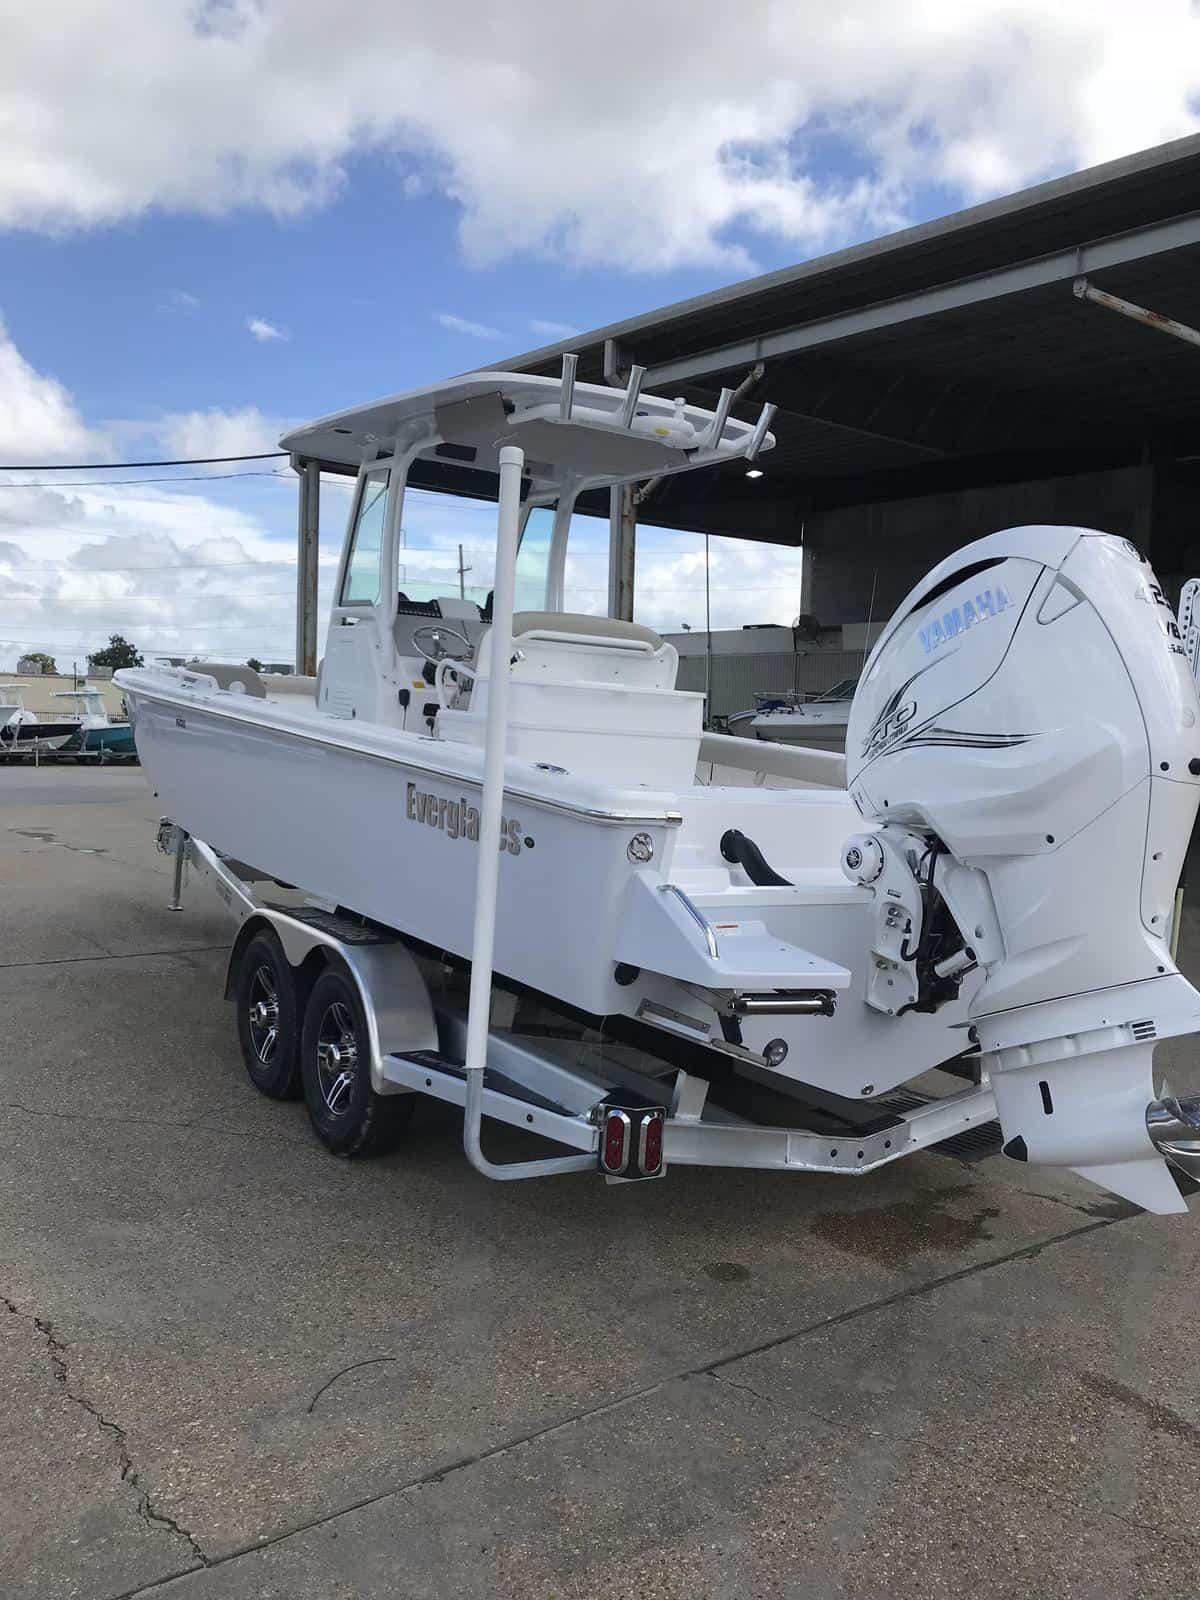 New  2019 27' Everglades Cc Fish Boat